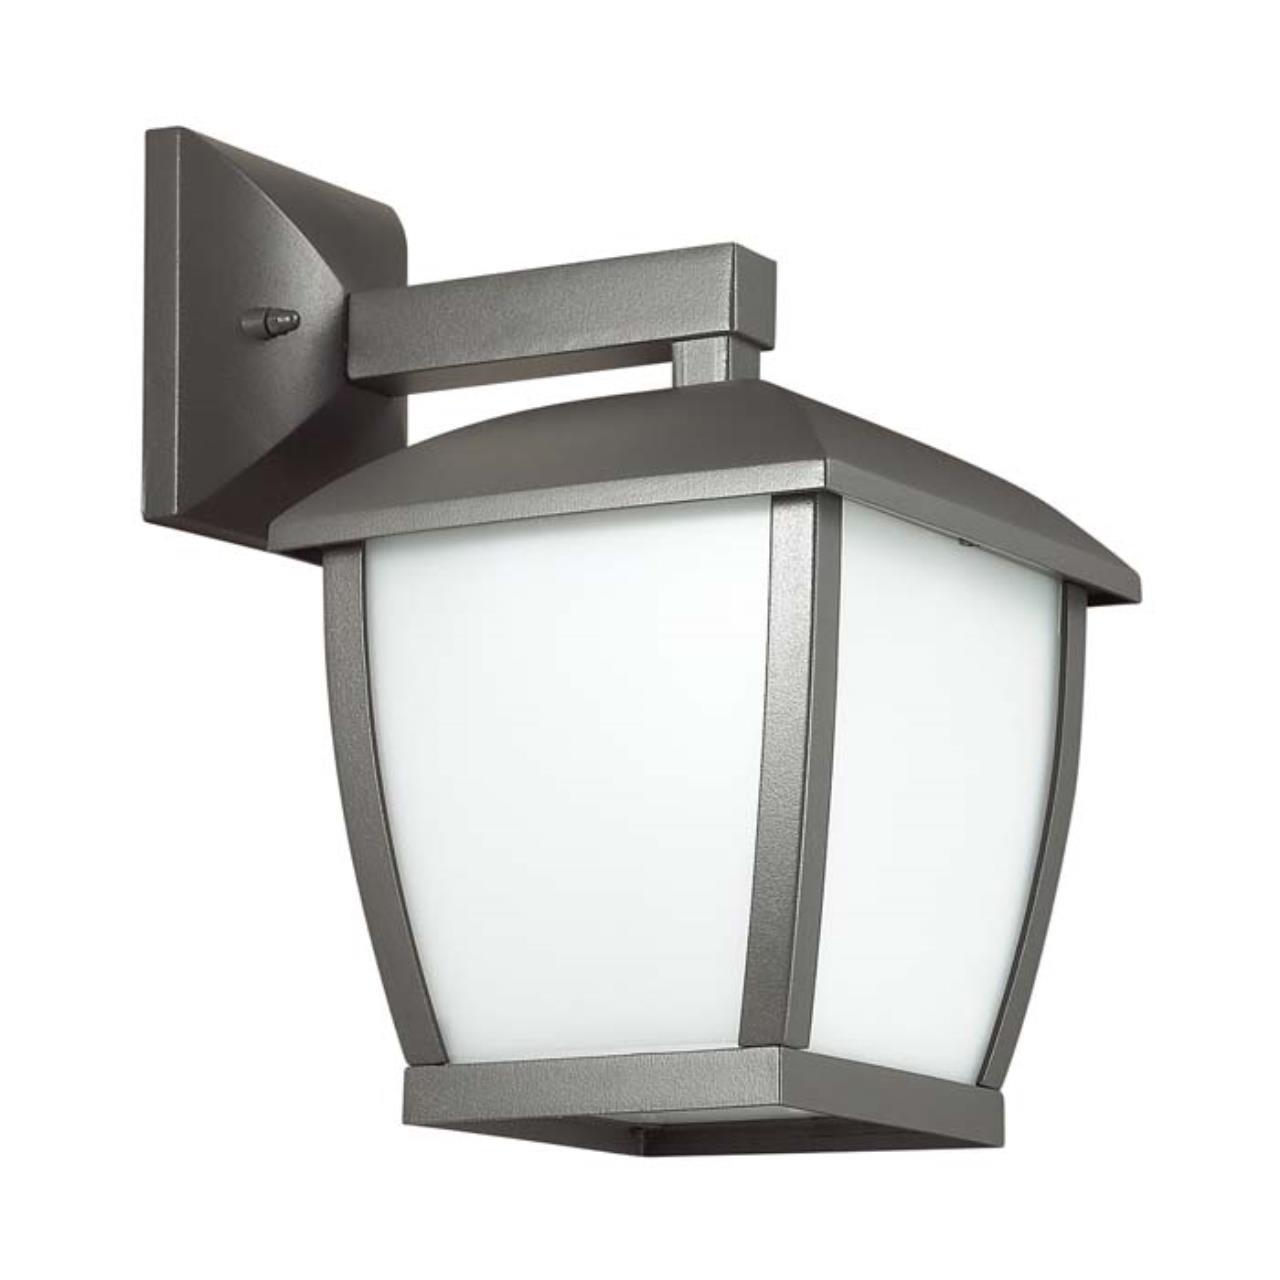 4051/1W NATURE ODL18 707 темно-серый/матовый белый Уличный настенный светильник IP44 E27 100W 220V T